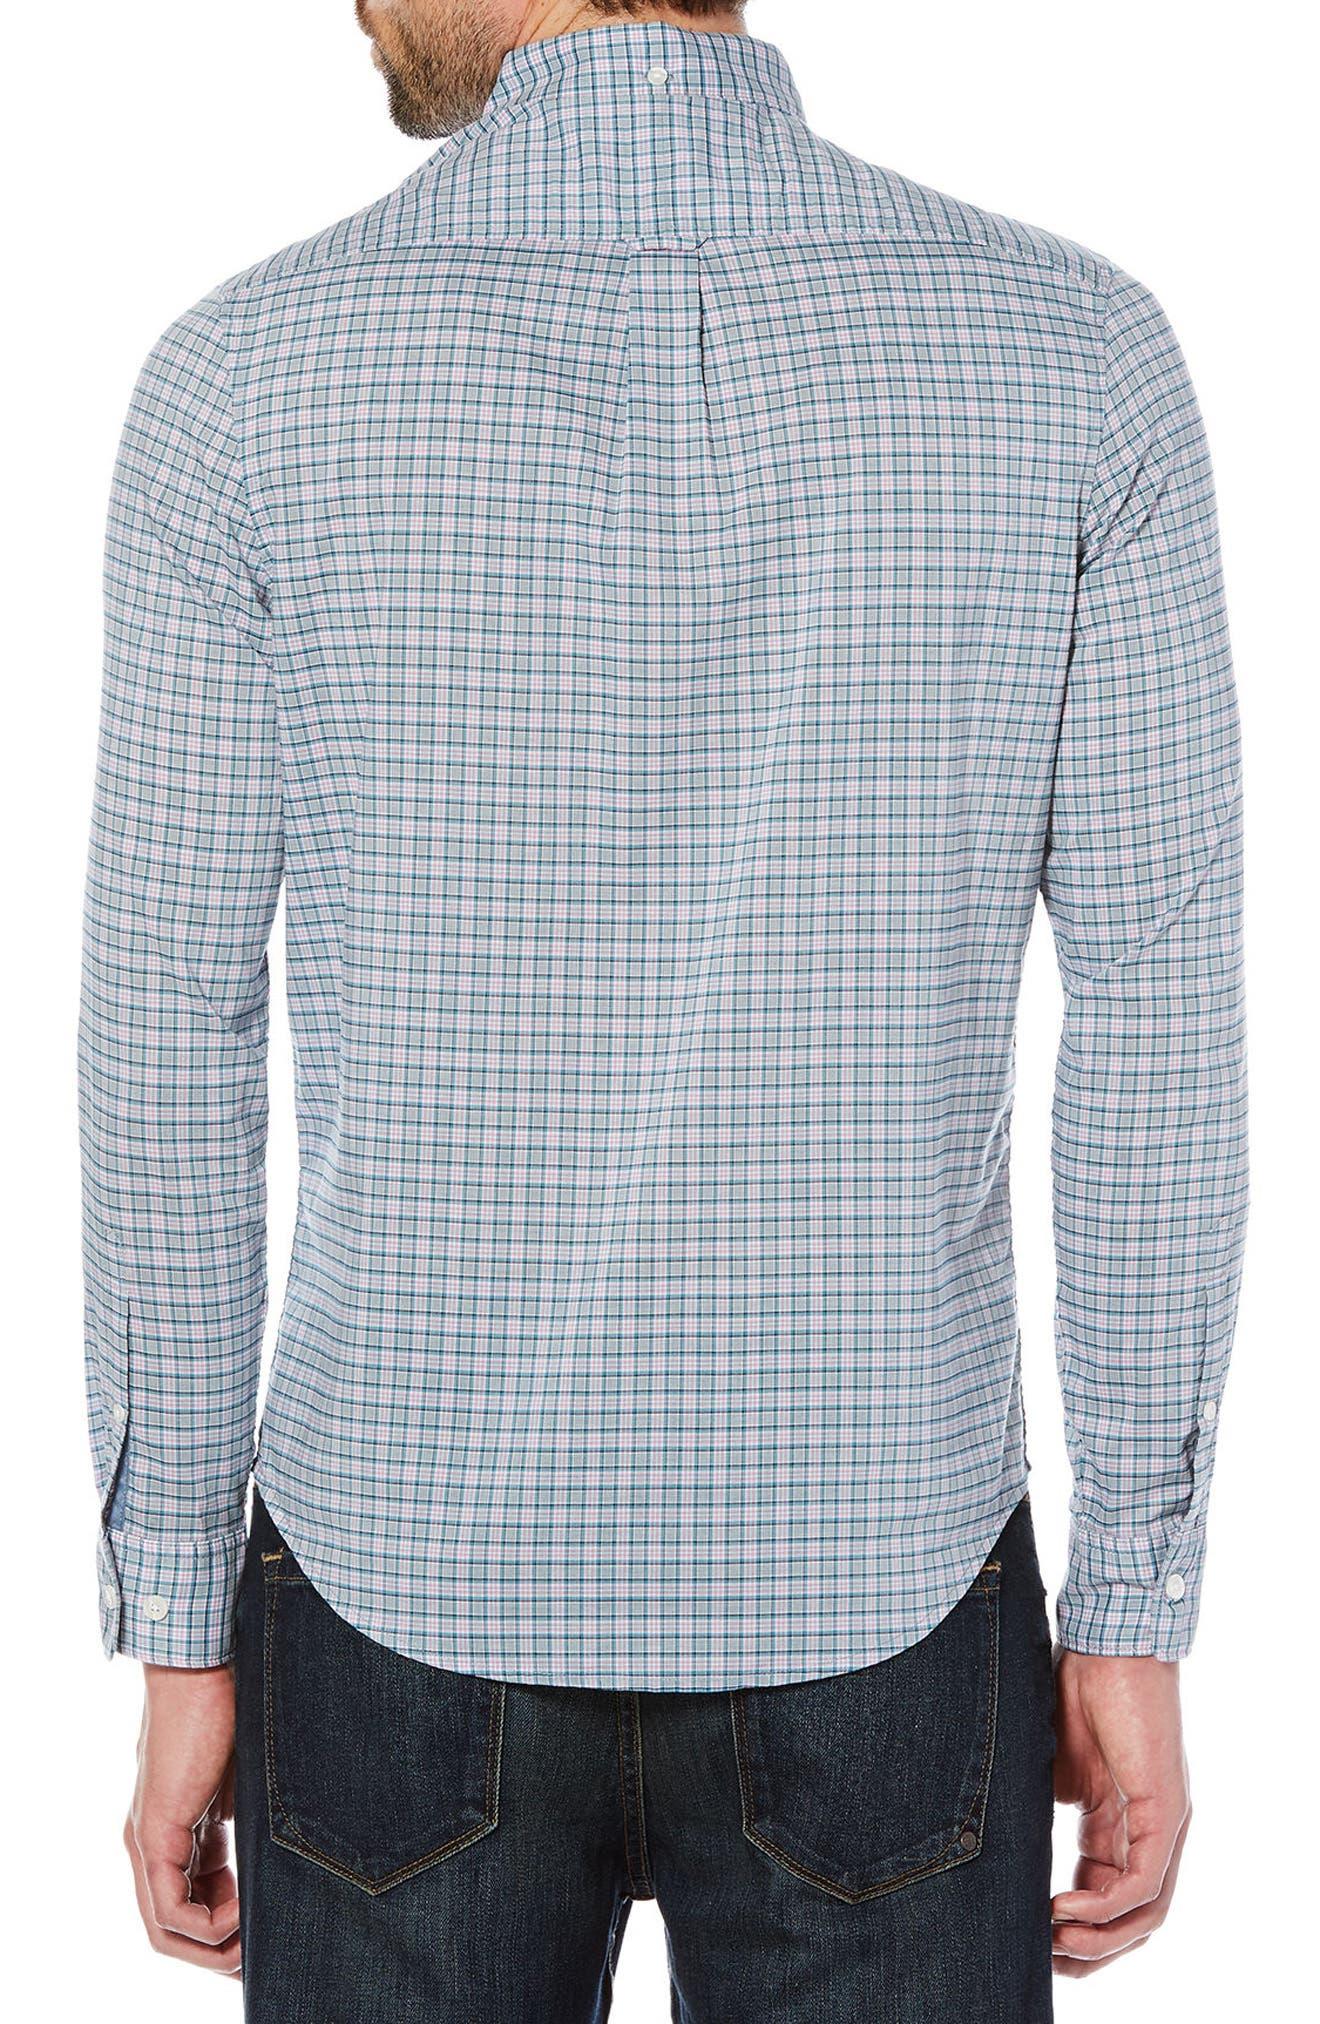 P55 Stretch Shirt,                             Alternate thumbnail 2, color,                             051